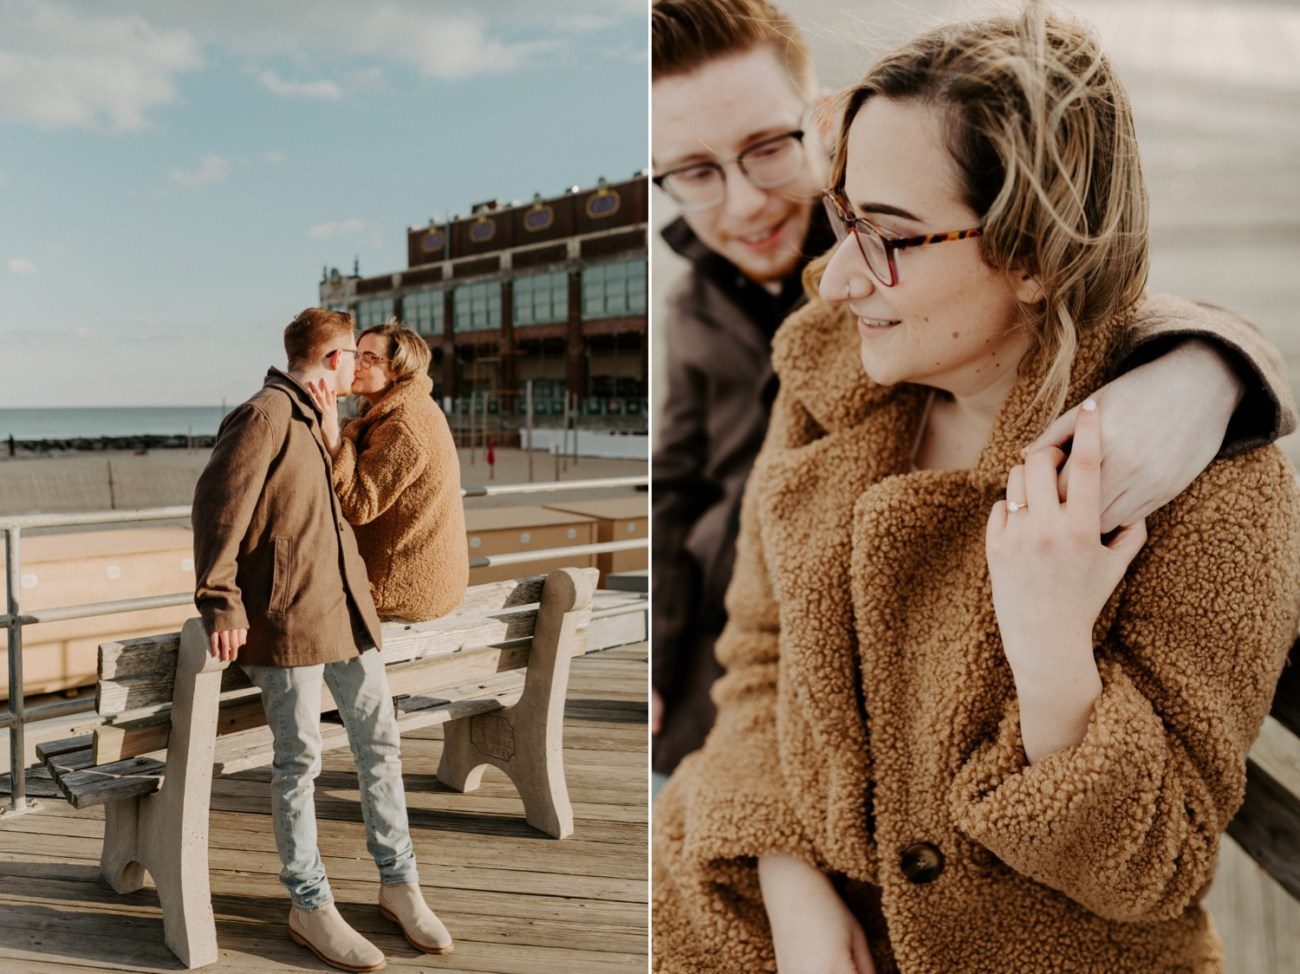 Asbury Park Engagement Photos Winter Beach Engagement Session New Jersey Wedding Photographer Anais Possamai Photography 007